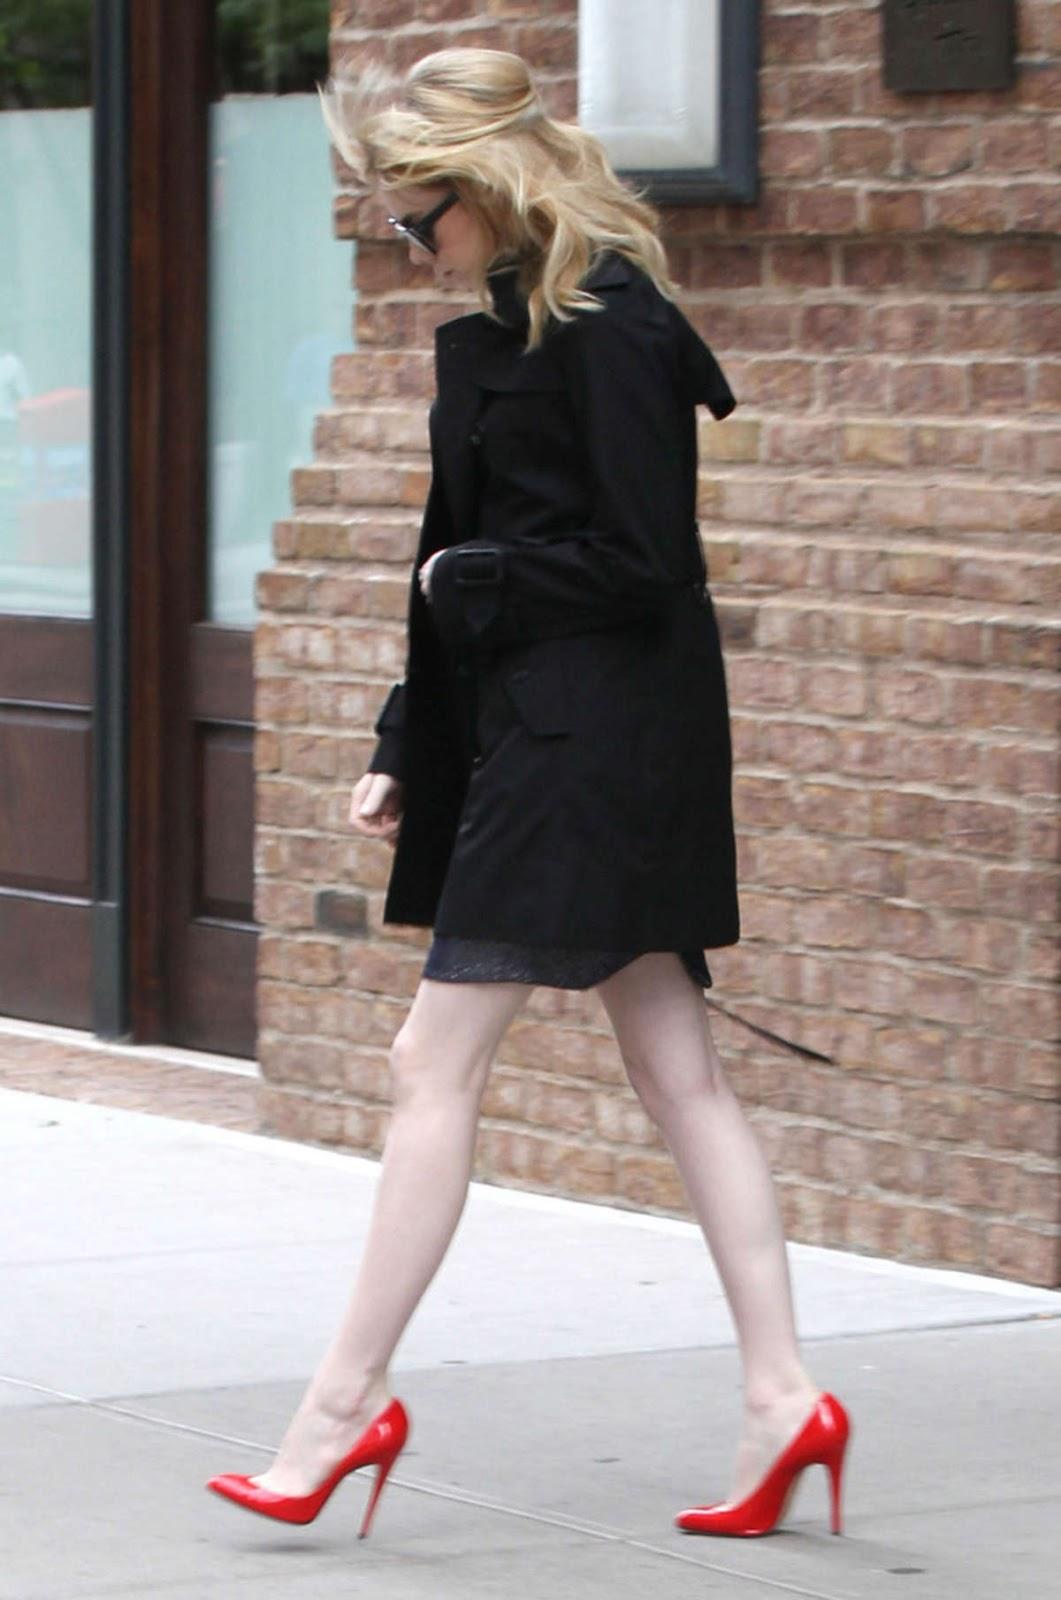 http://1.bp.blogspot.com/-V71WCnoJBEg/T-3IIq_ZmKI/AAAAAAAAHw4/FPtLfia48NU/s1600/Emma+Stone+Candids+-+Leaving+Her+Hotel+In+New+York+01.jpg